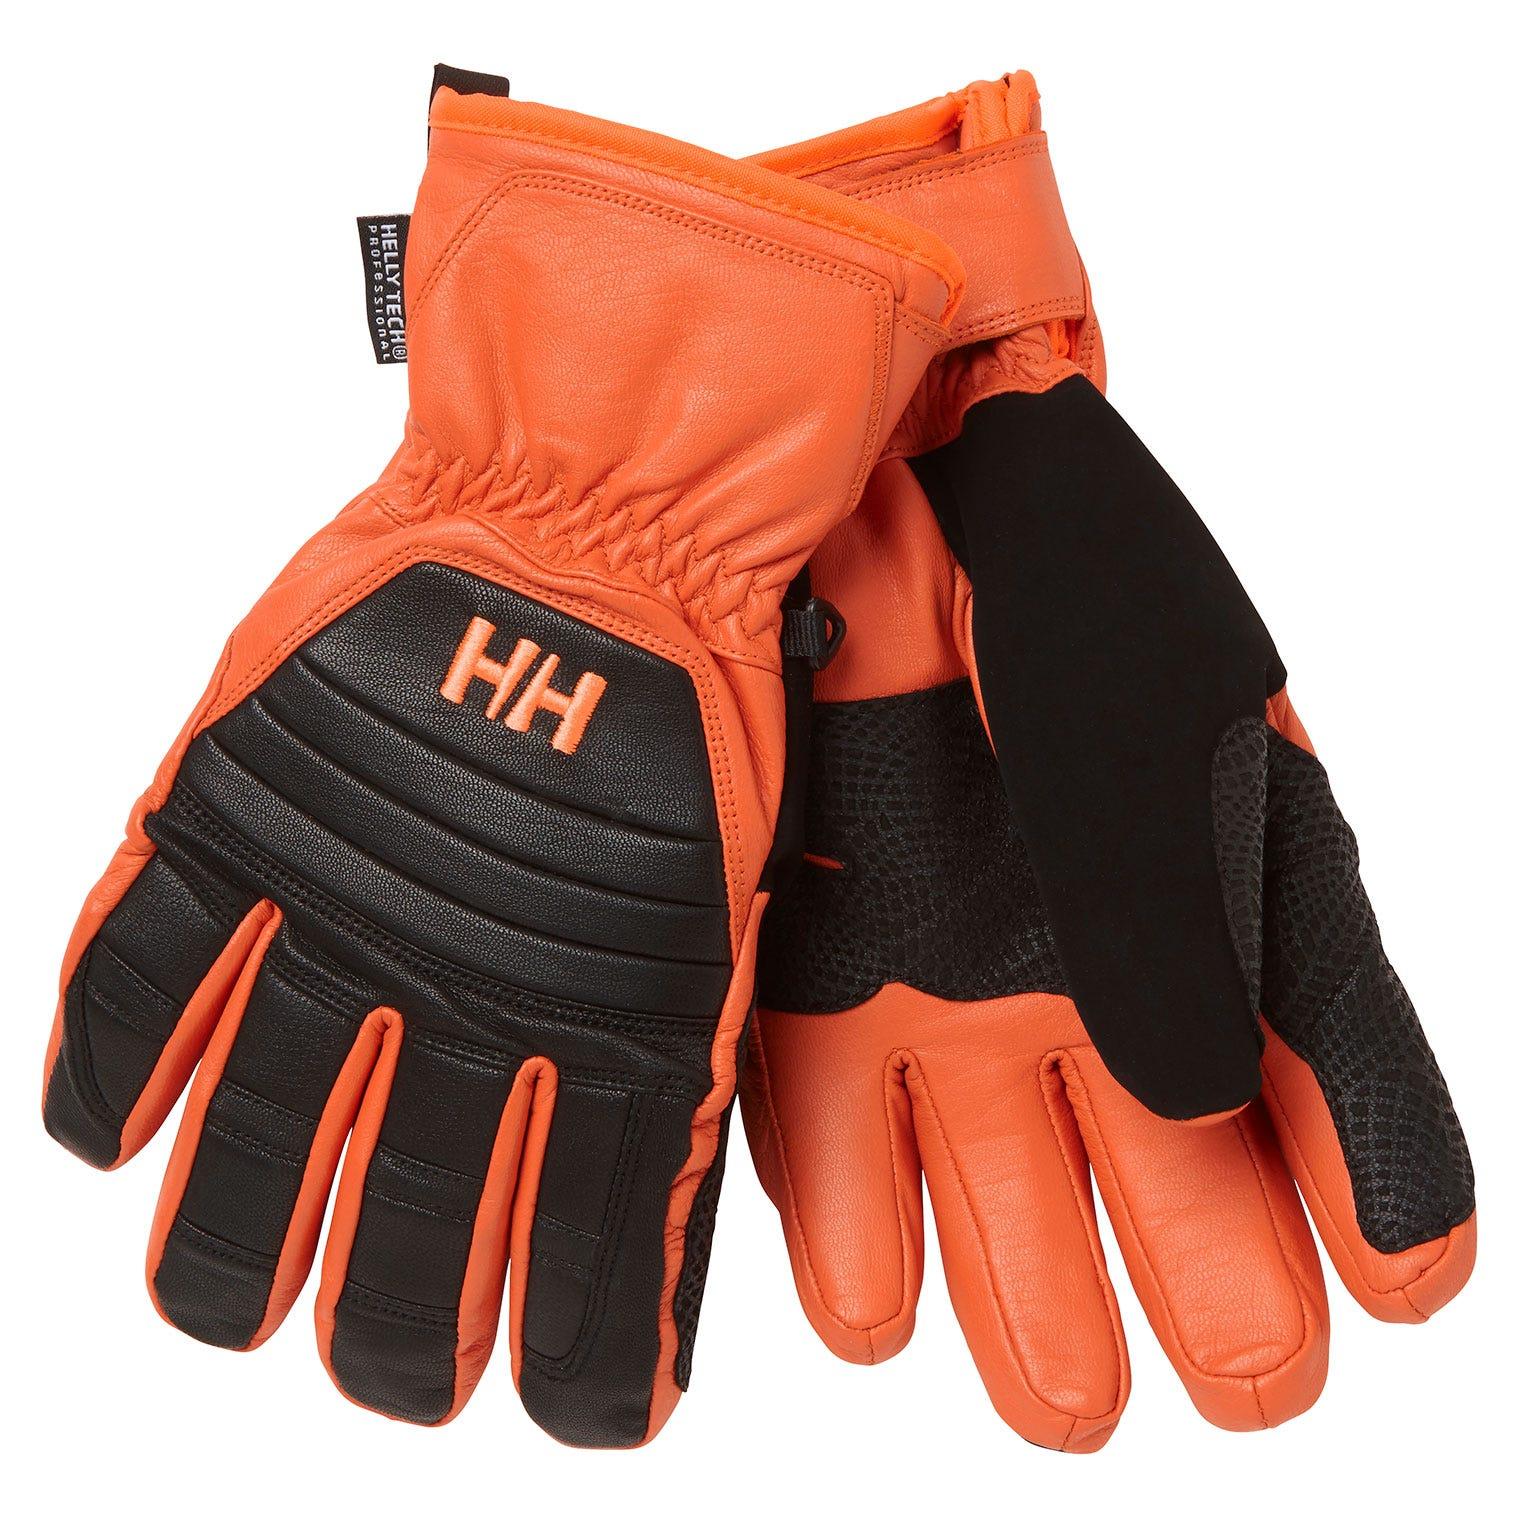 Helly Hansen Ullr Leather Ht Glove Mens Black S